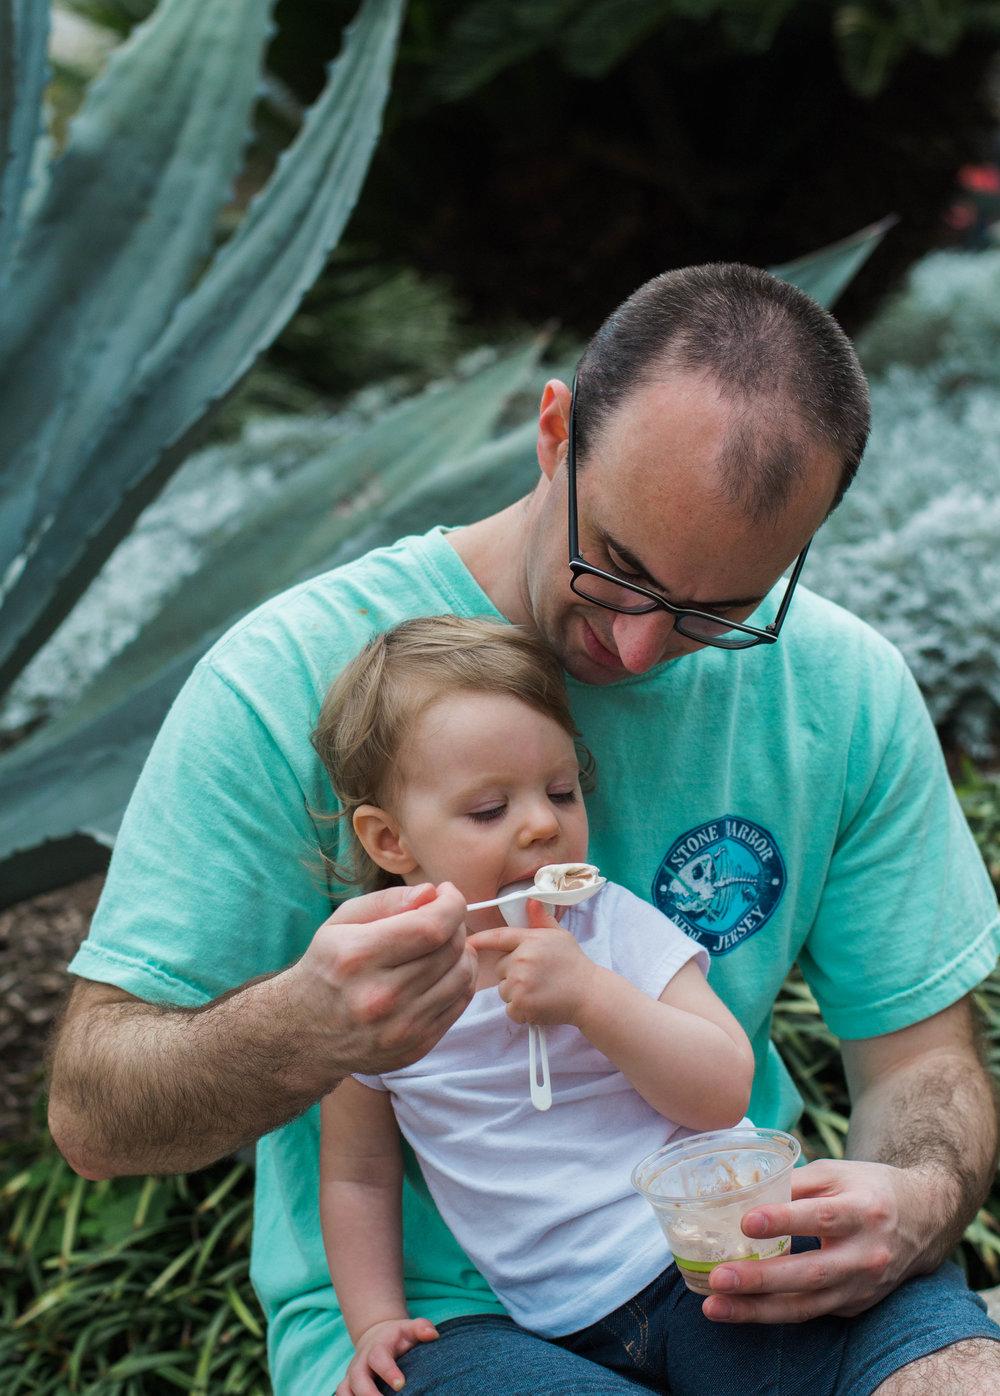 Sharing ice cream at the zoo!!